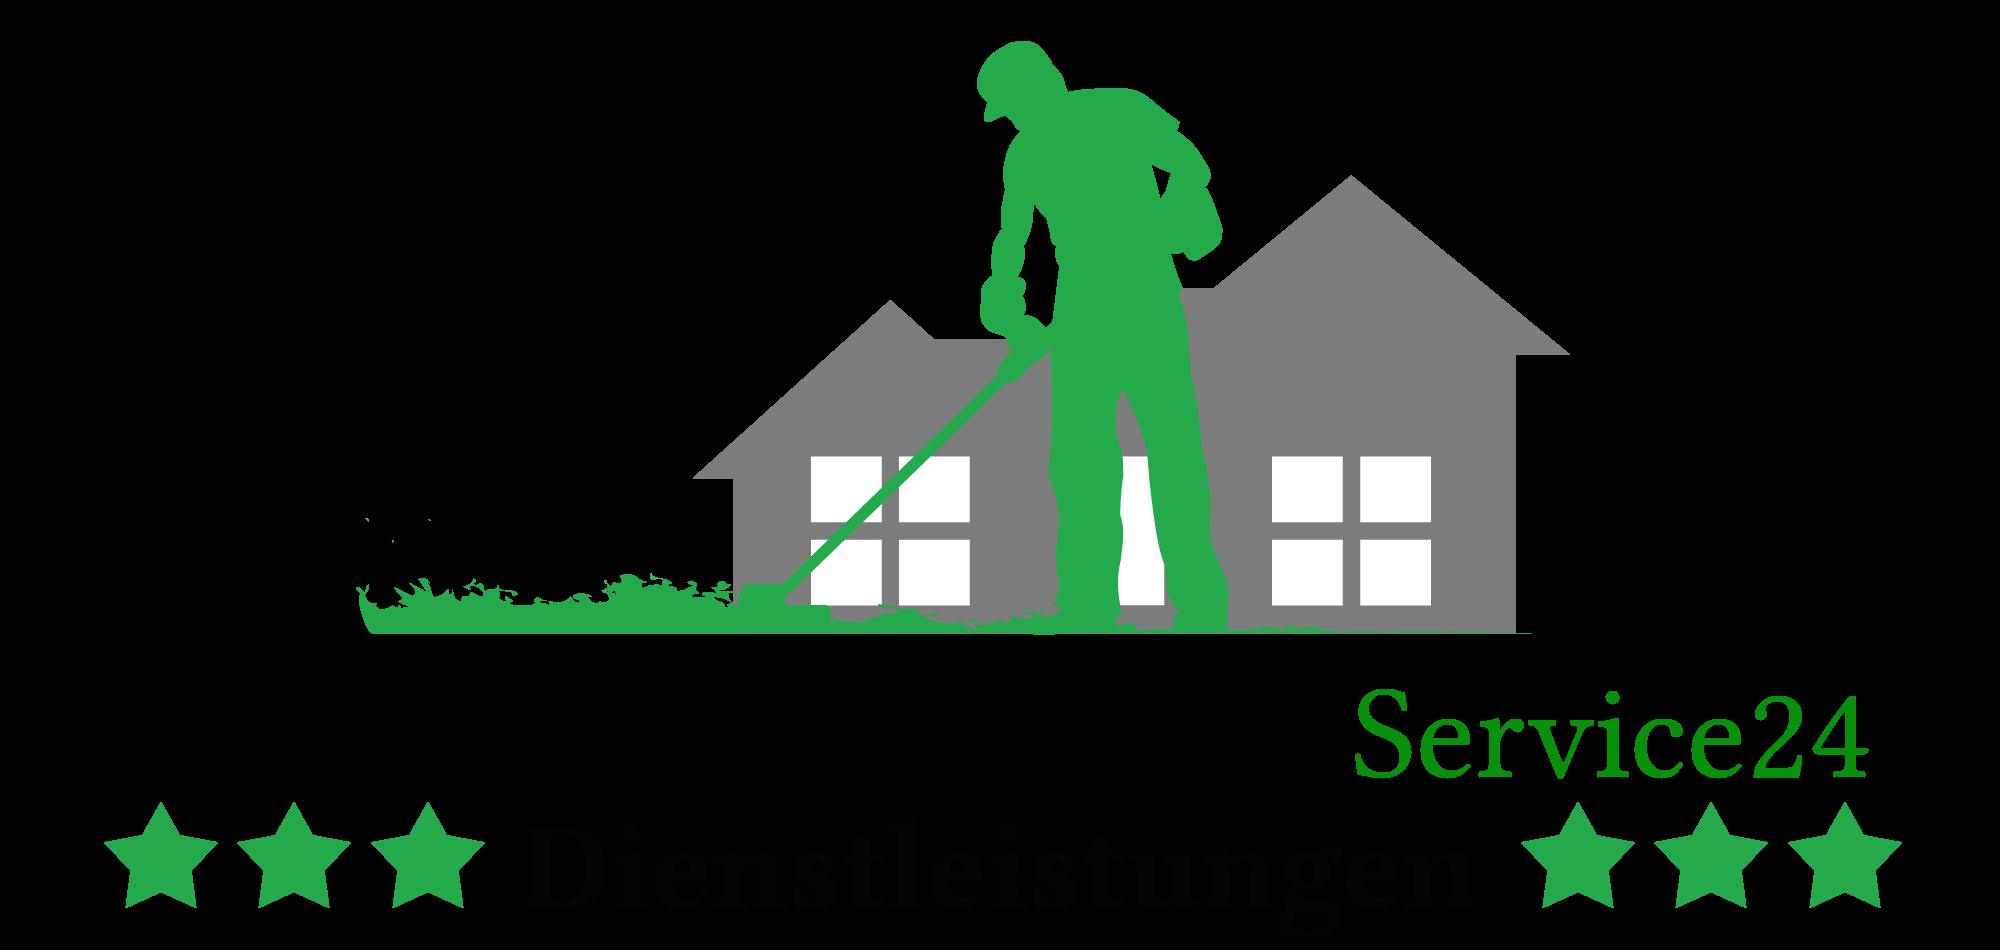 Immobilien & Gewerbe Service24